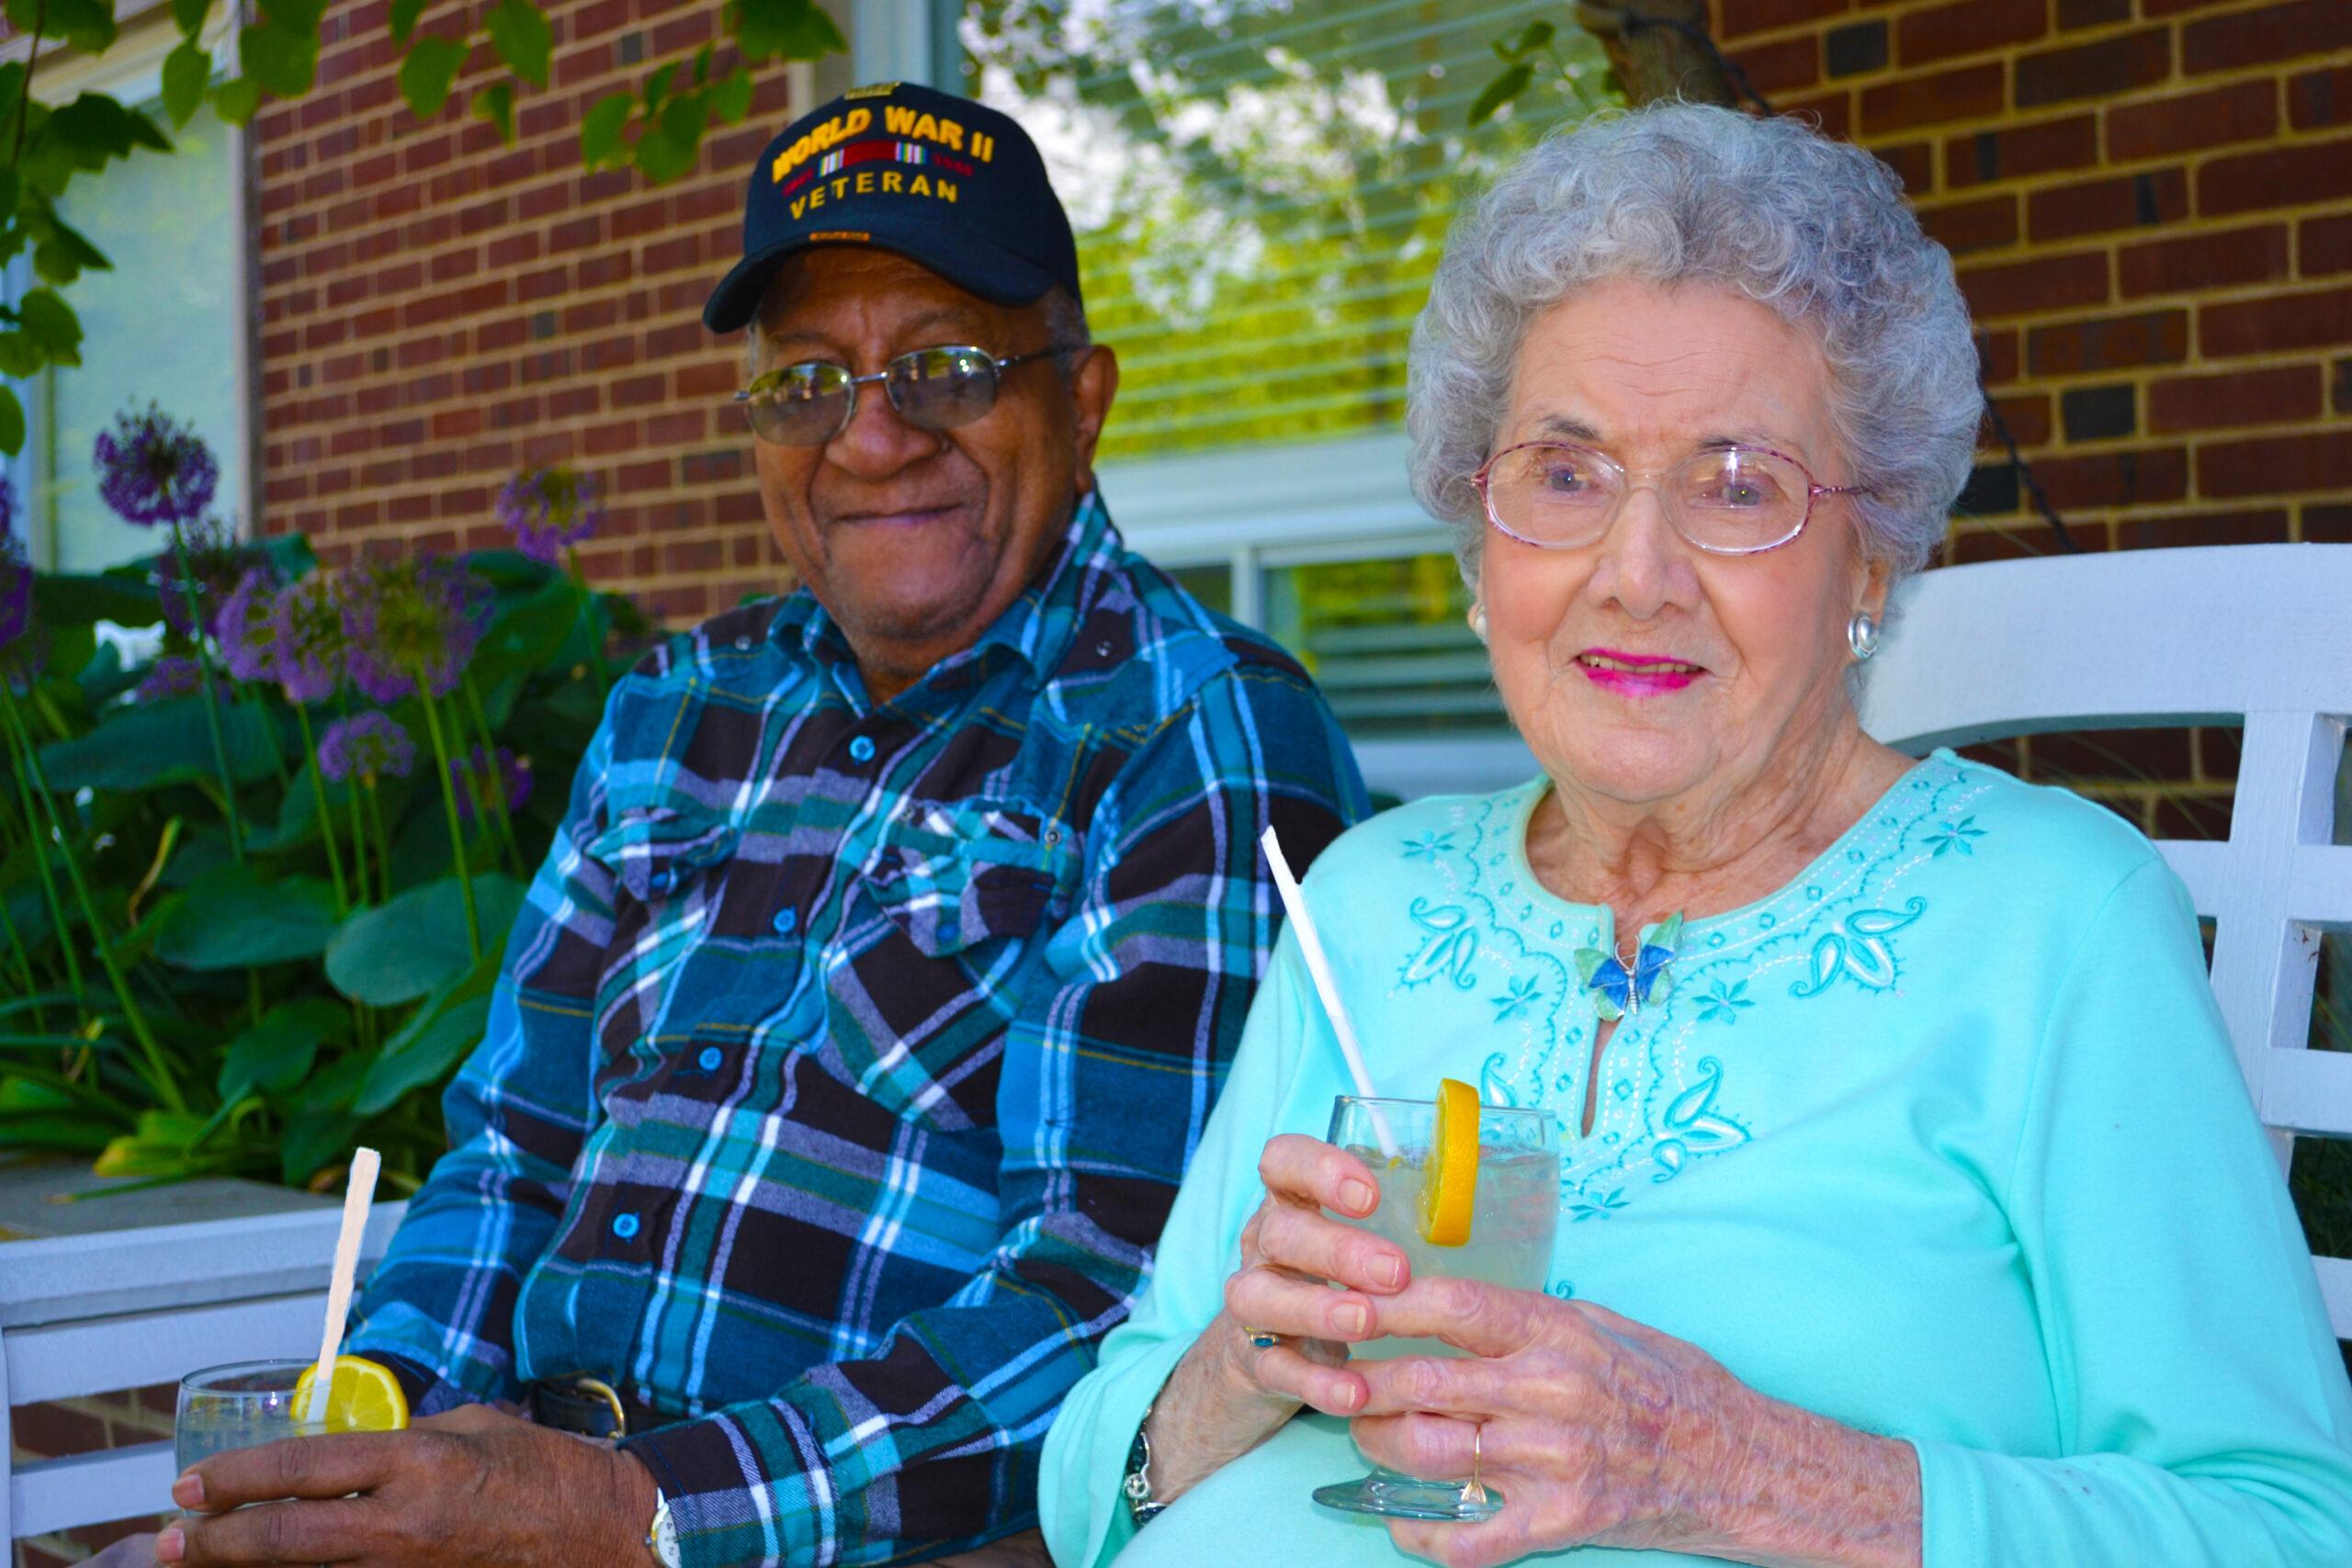 Elder Man and Woman Drinking Lemonade